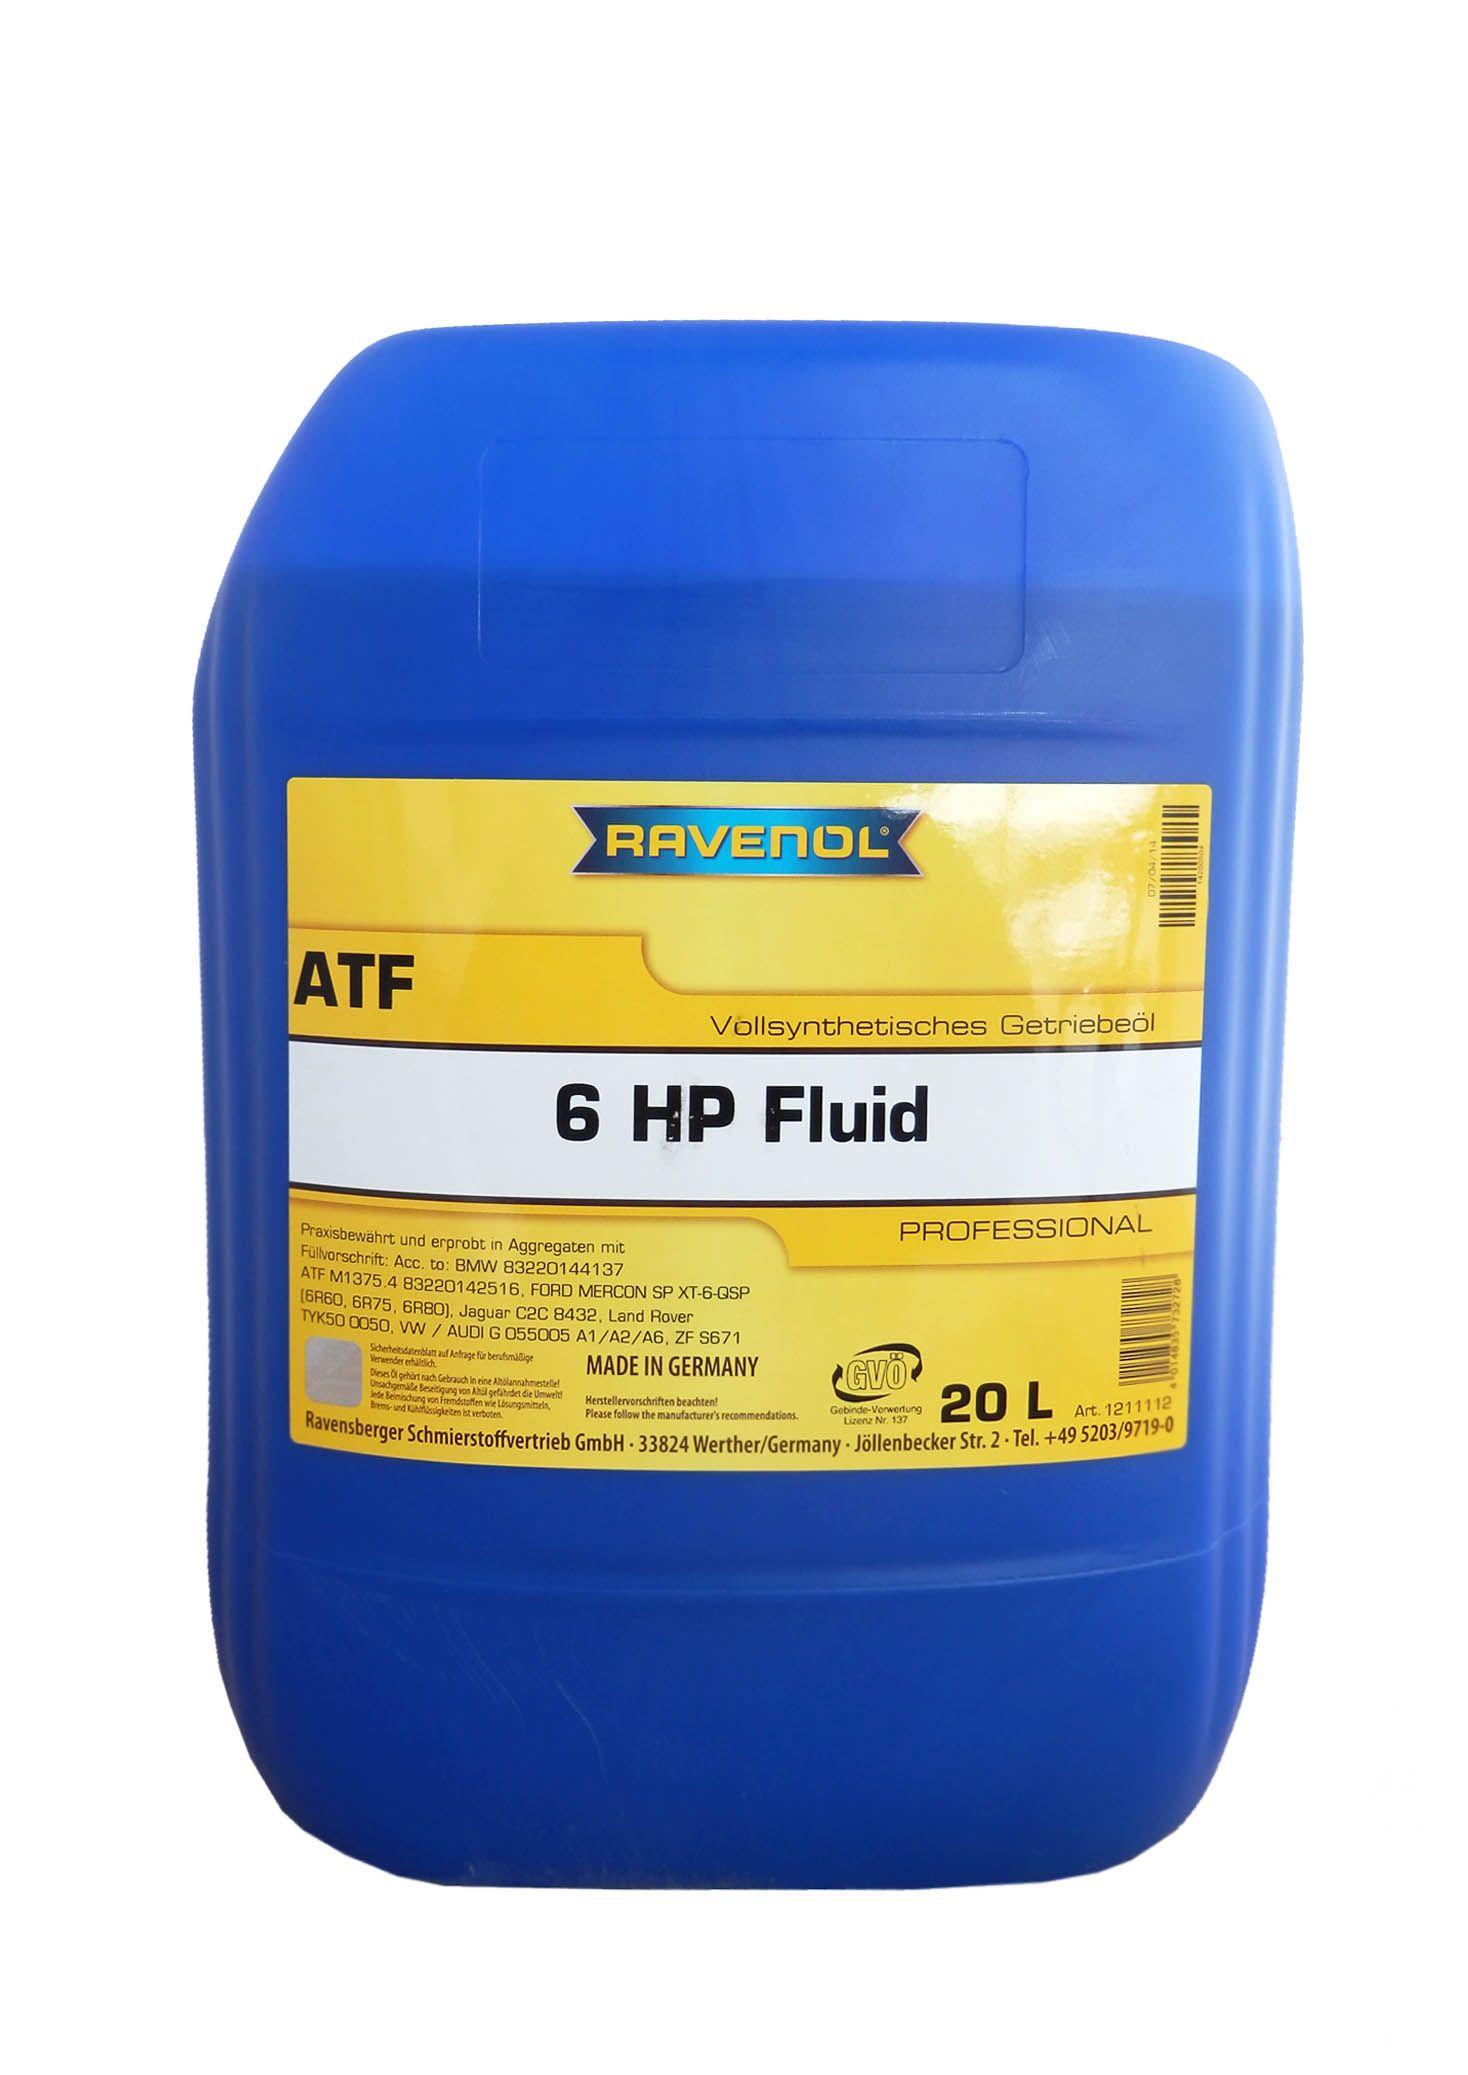 Масло Ravenol ATF 6 HP Fluid (4014835732728) (20л)Ravenol<br><br><br>Артикул: 4014835732728<br>Бренд: Ravenol